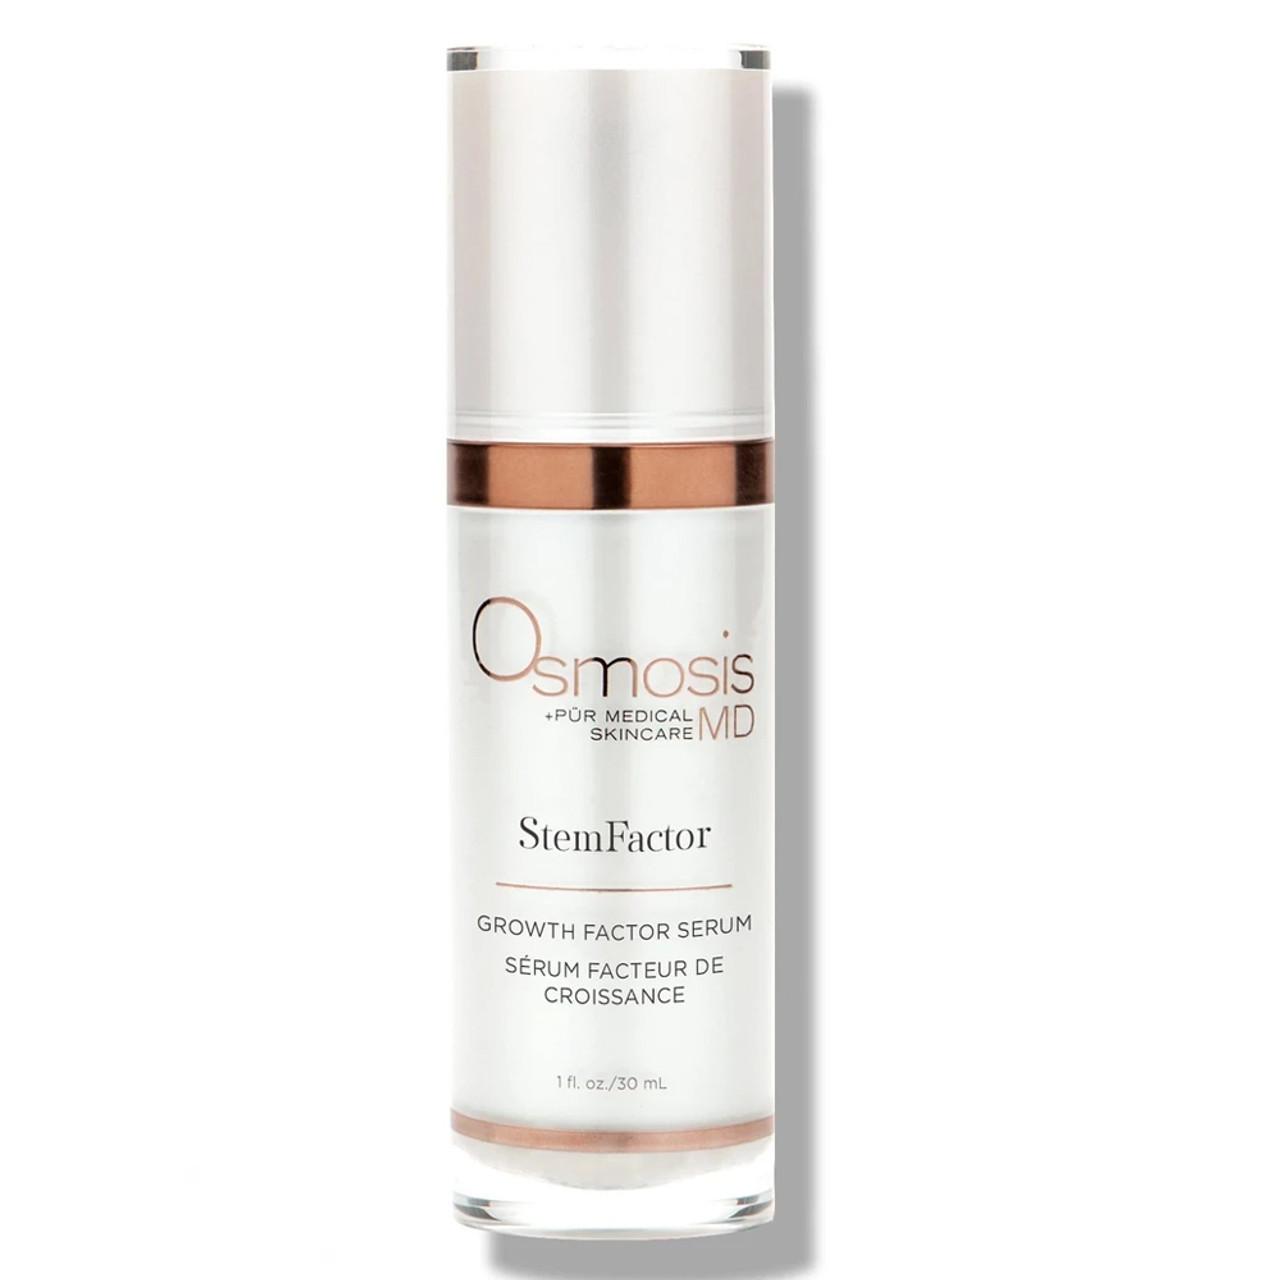 Osmosis +Skincare MD StemFactor - Growth Factor Serum BeautifiedYou.com